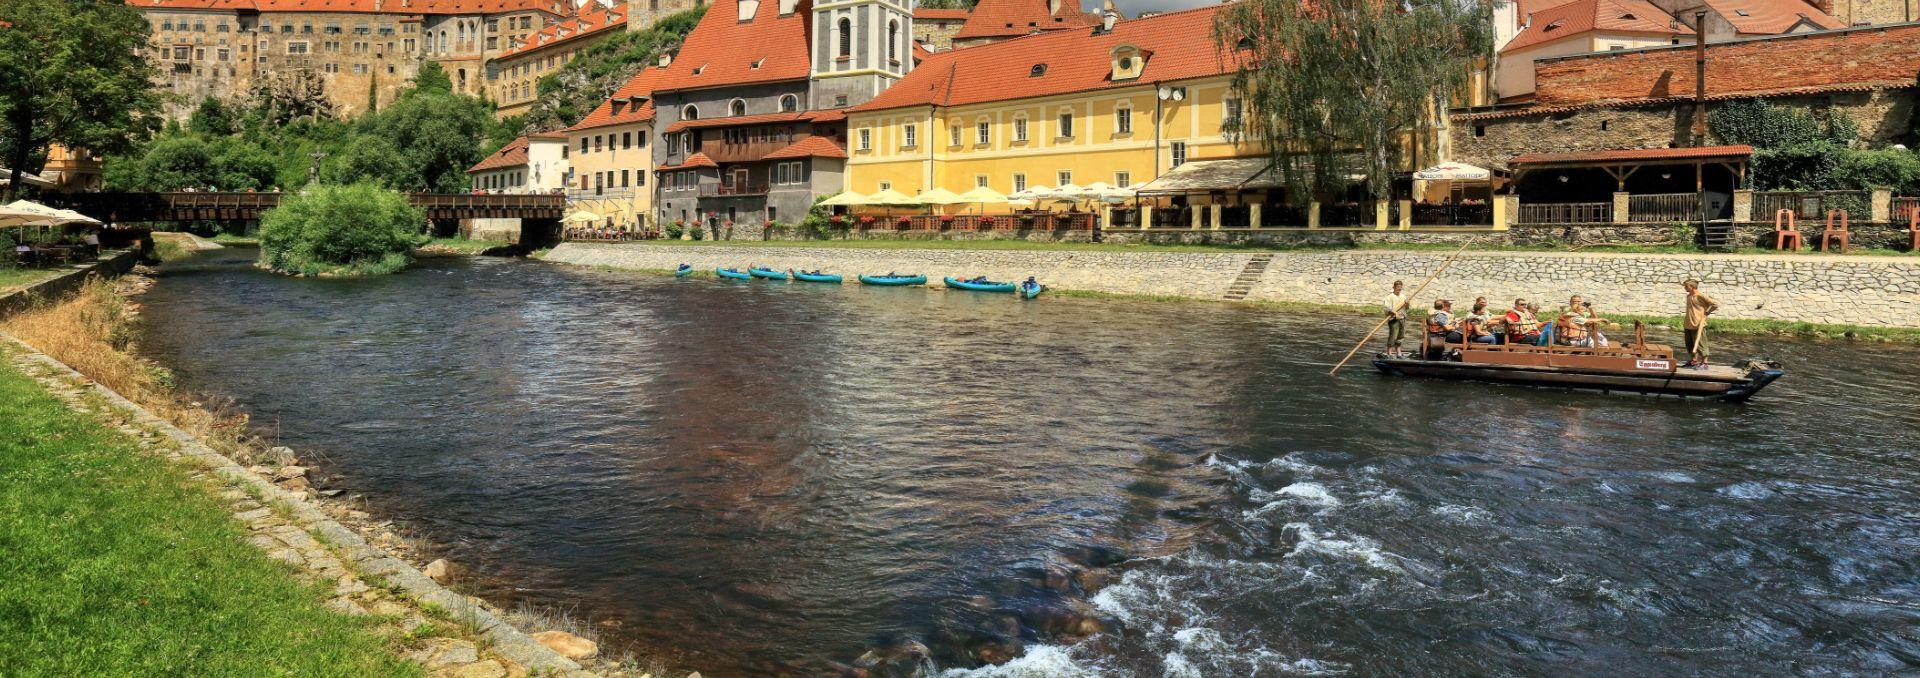 Wooden rafts on the Vltava River